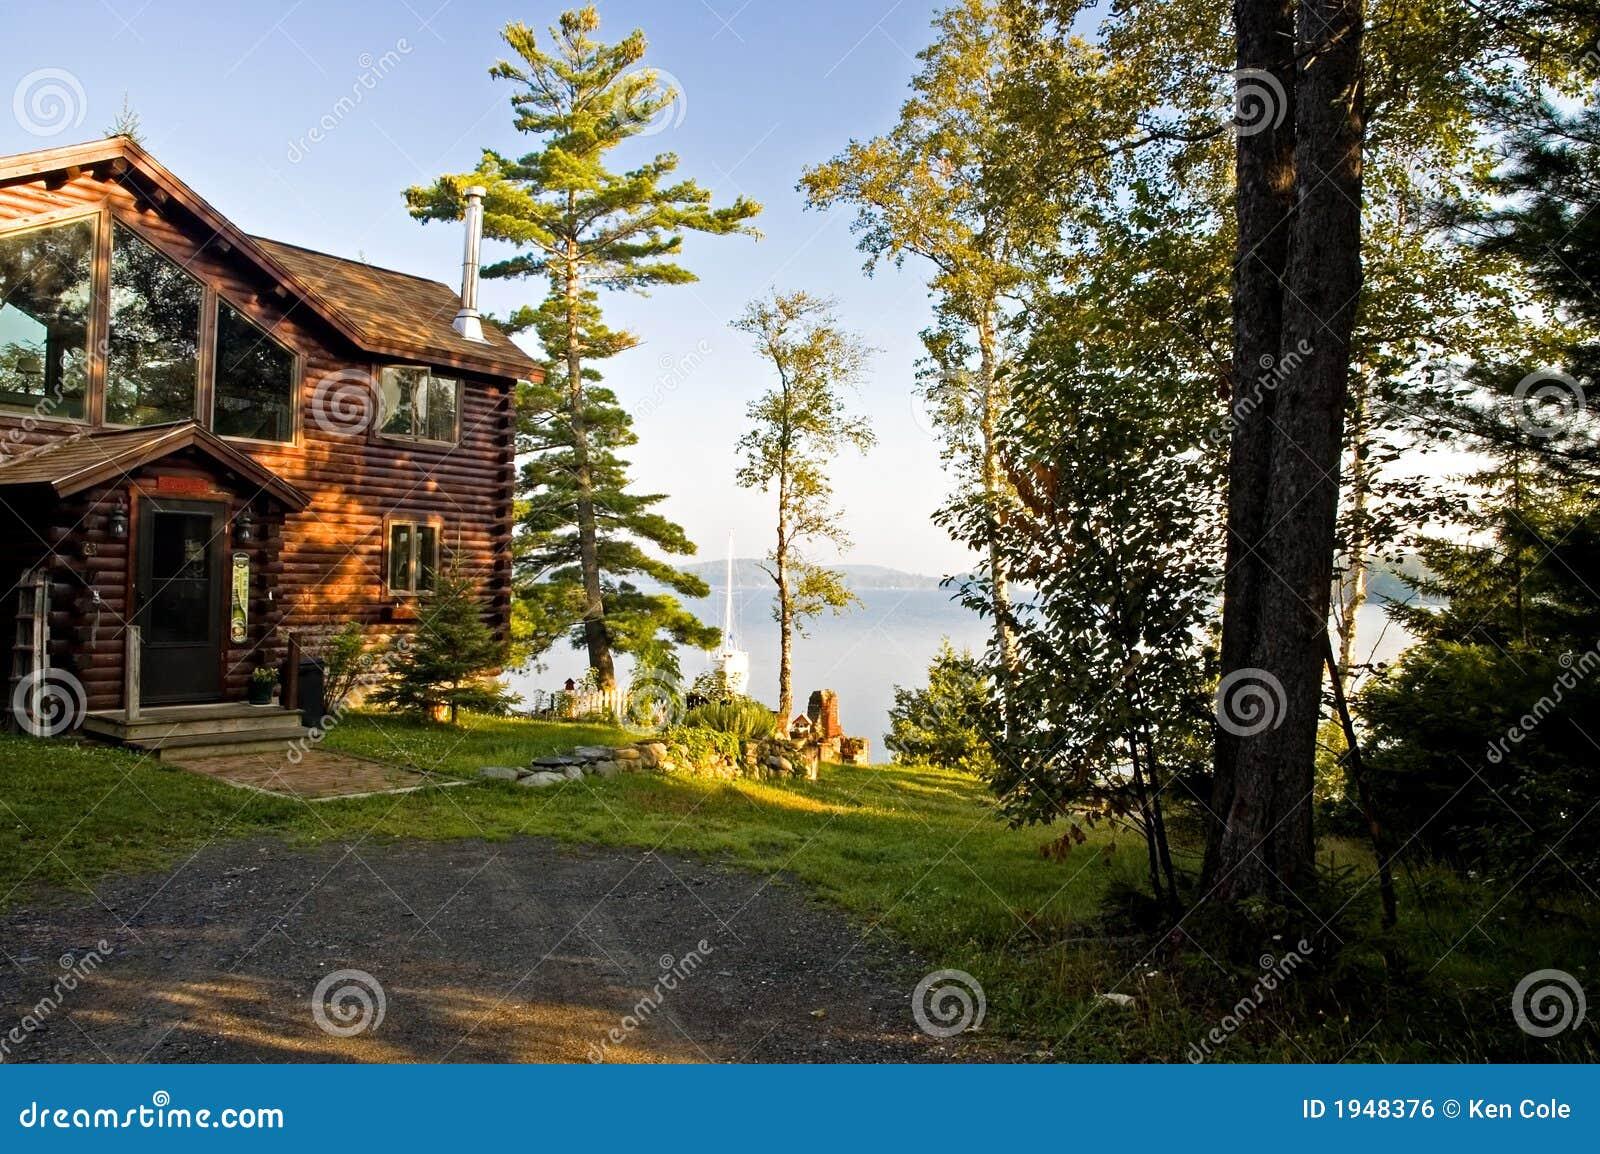 Log cabin on a lake royalty free stock photography image 7866317 - Luxury Log Cabin On A Lake Royalty Free Stock Image